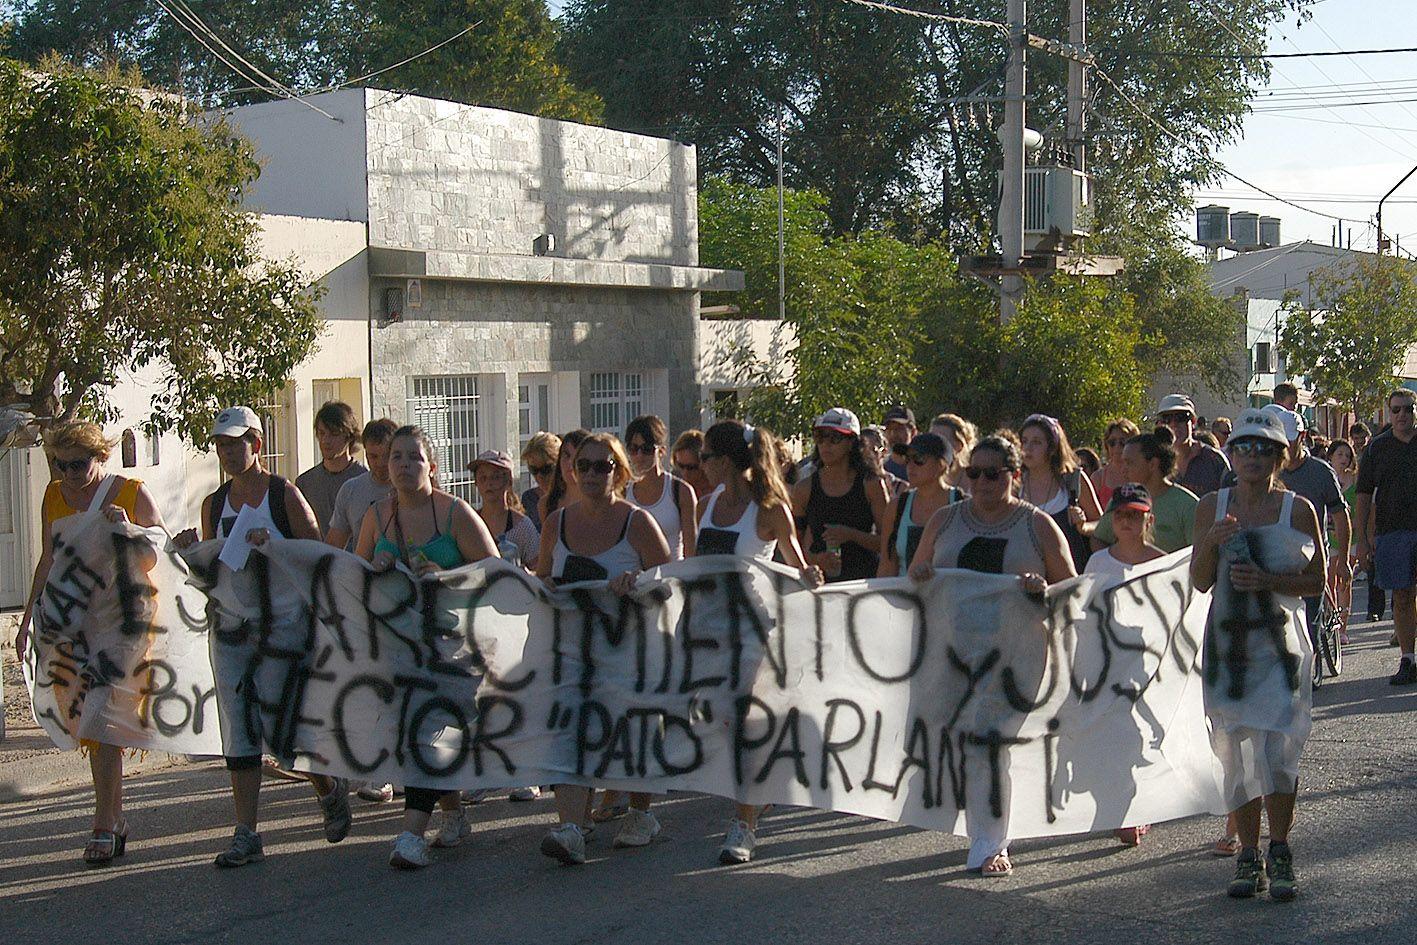 Sigue impune el asesinato de Héctor Parlanti